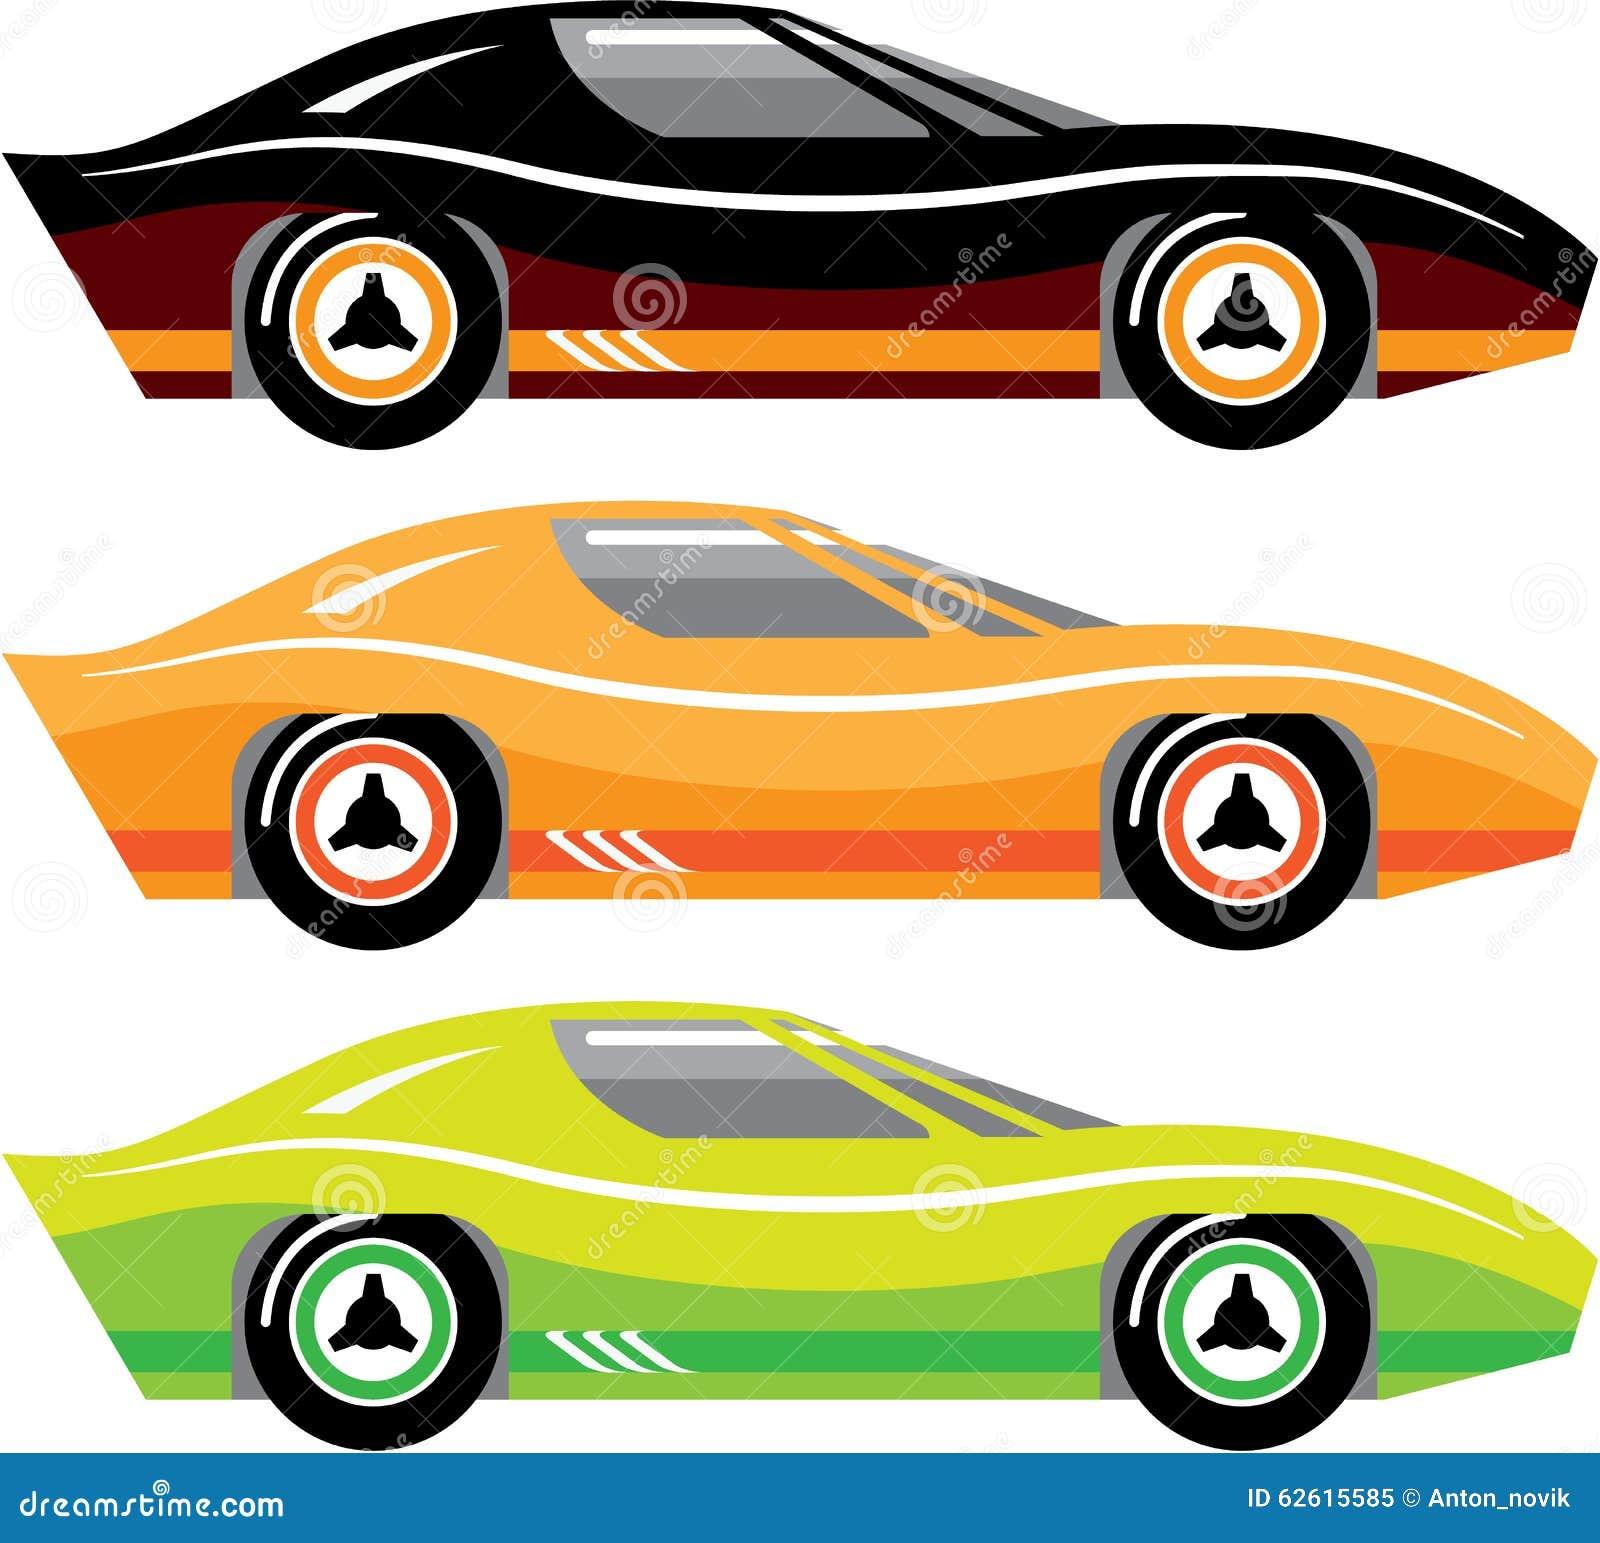 Vintage Sports Car Simple Basic Vector Illustration - Simple sports car